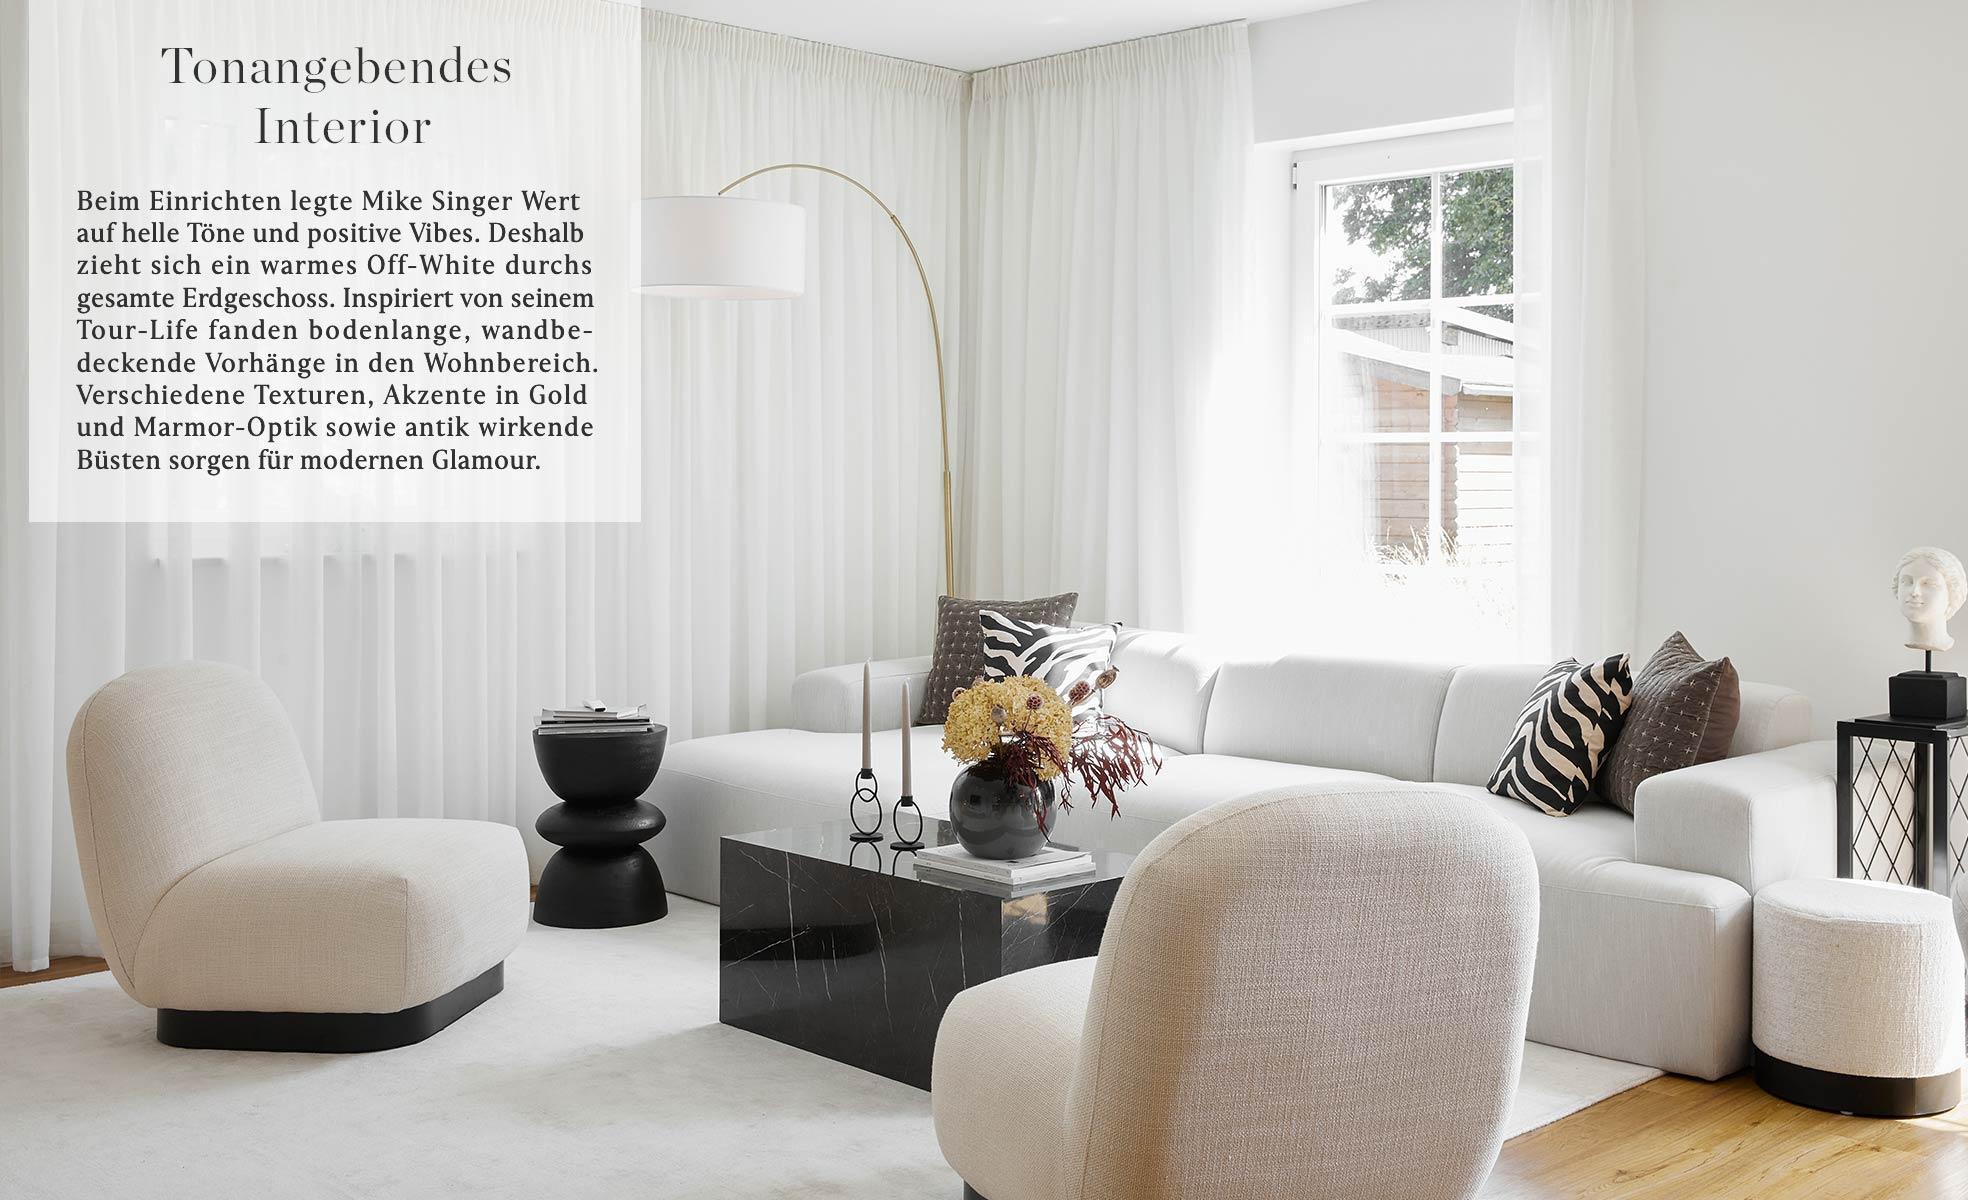 Mike Singer Farben Off White Materialien